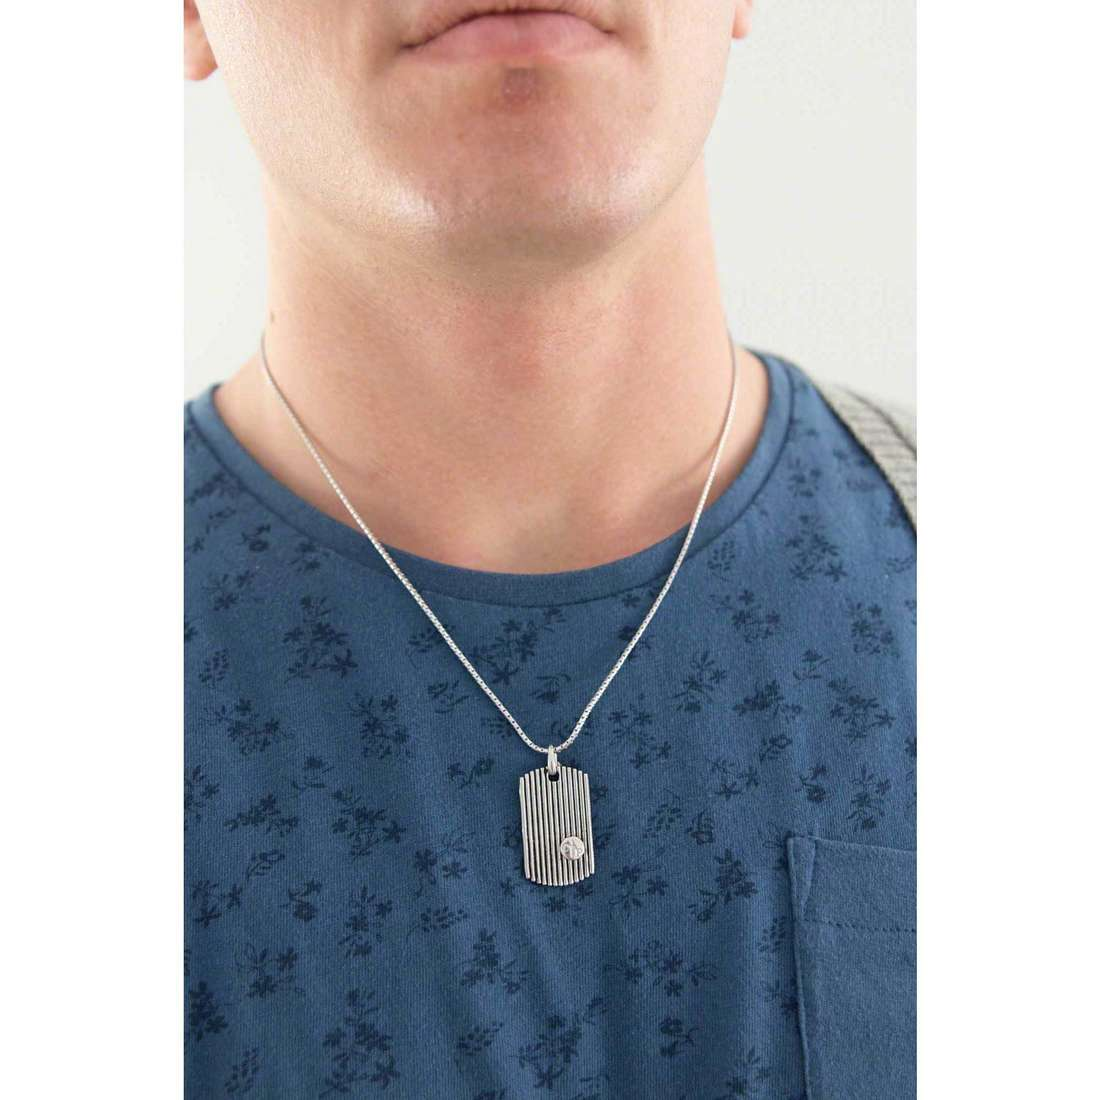 Cesare Paciotti necklaces man JPCL0975B indosso